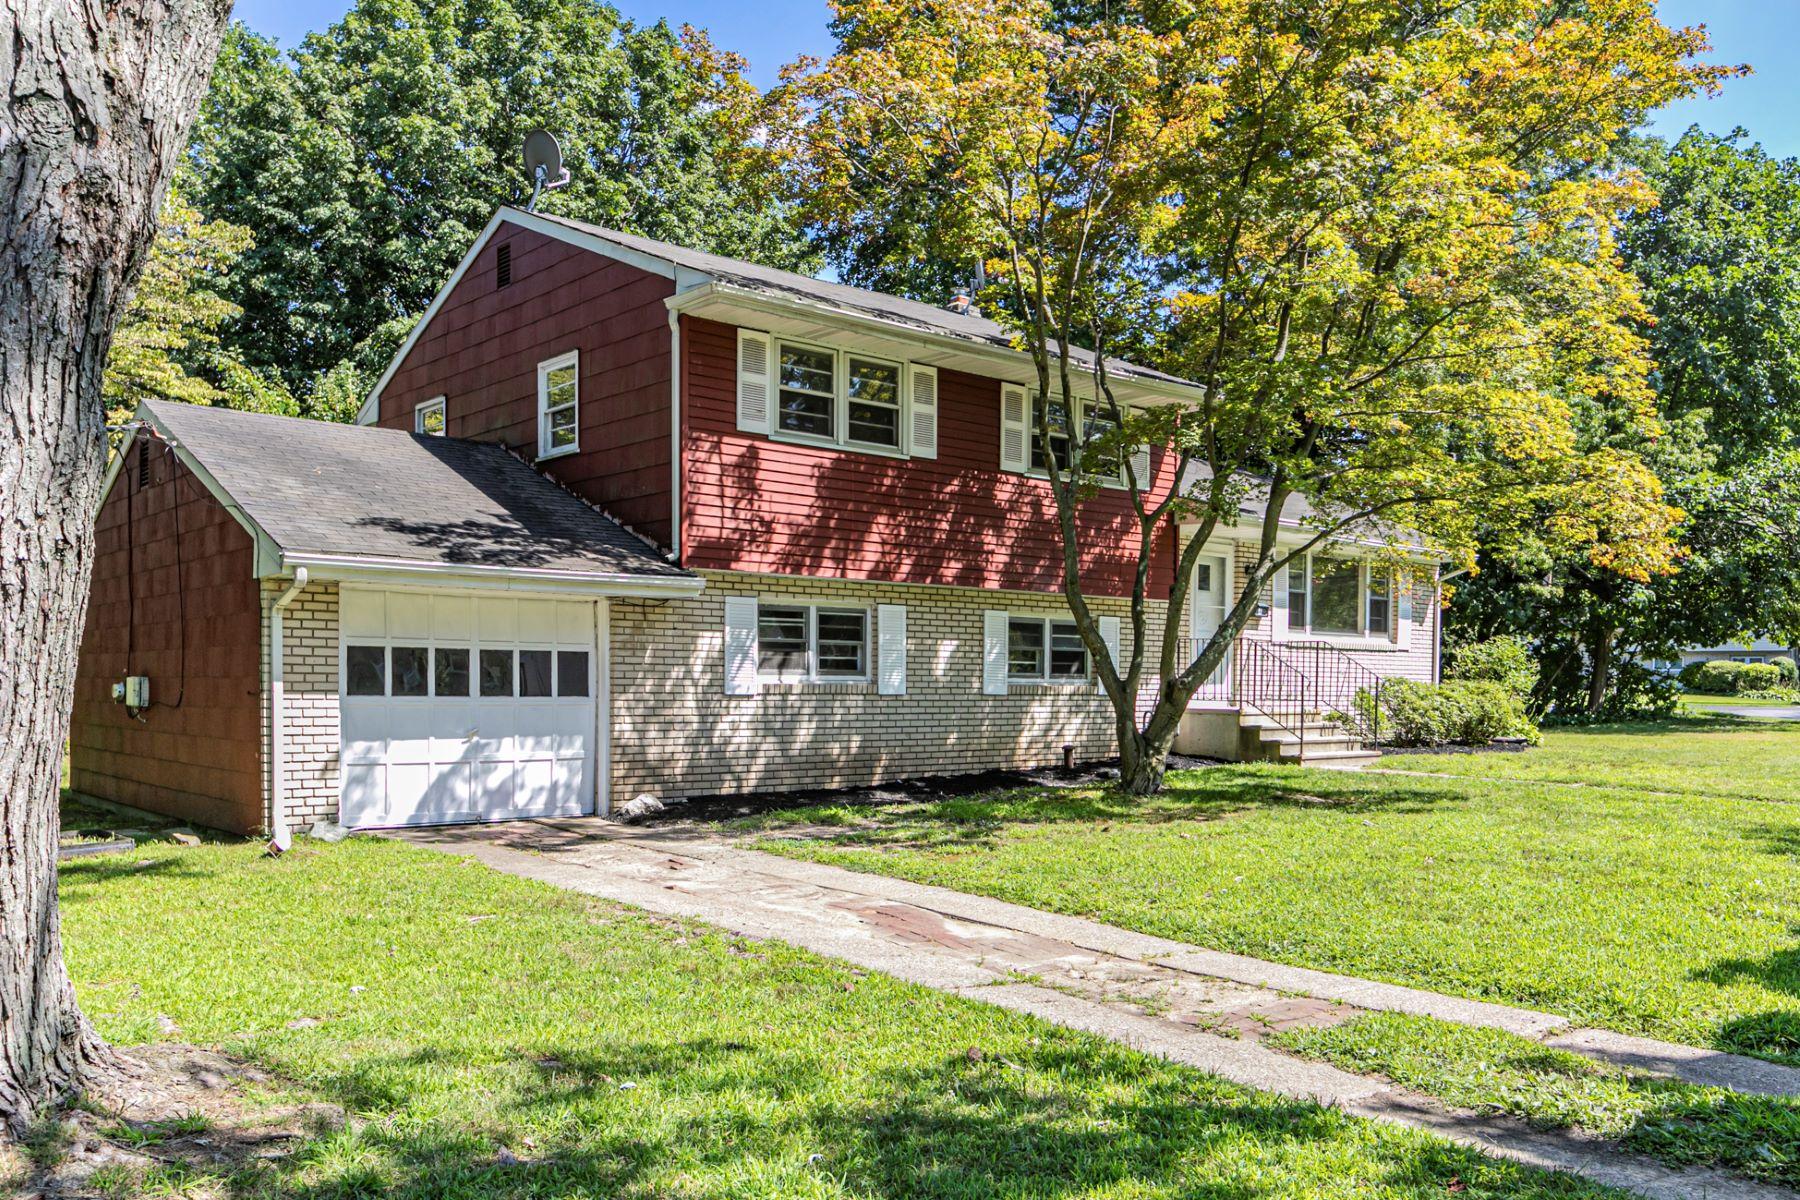 Additional photo for property listing at A Great Start To Home Ownership 4 Merritt Drive, Lawrenceville, New Jersey 08648 Amerika Birleşik Devletleri